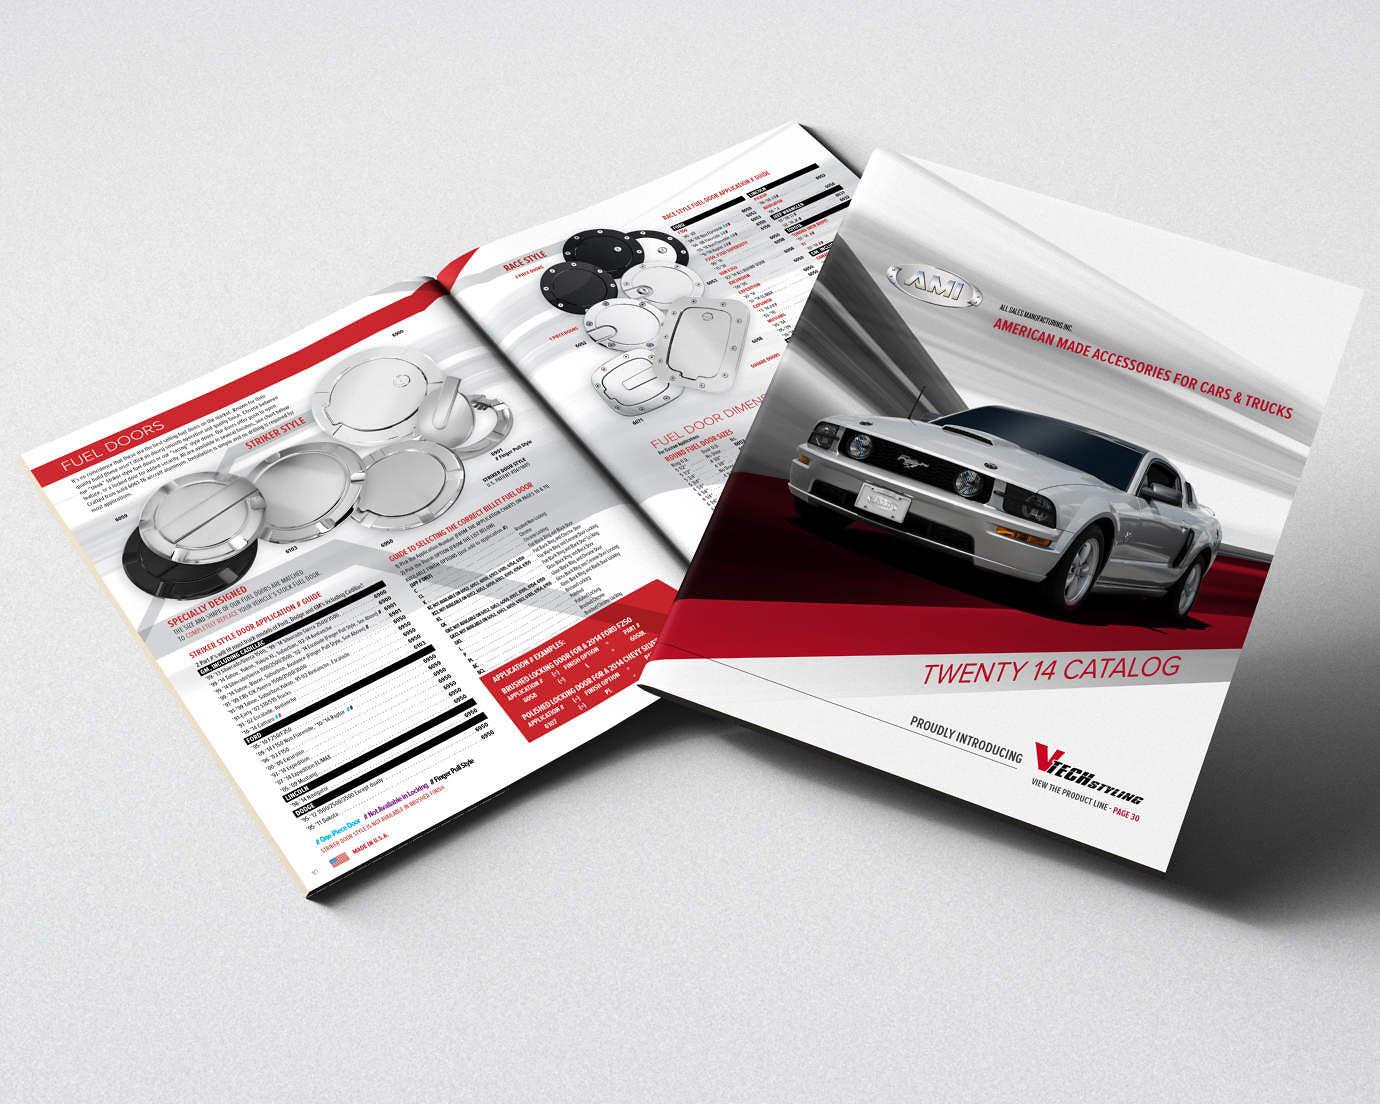 automotive-catalog-design-thumb